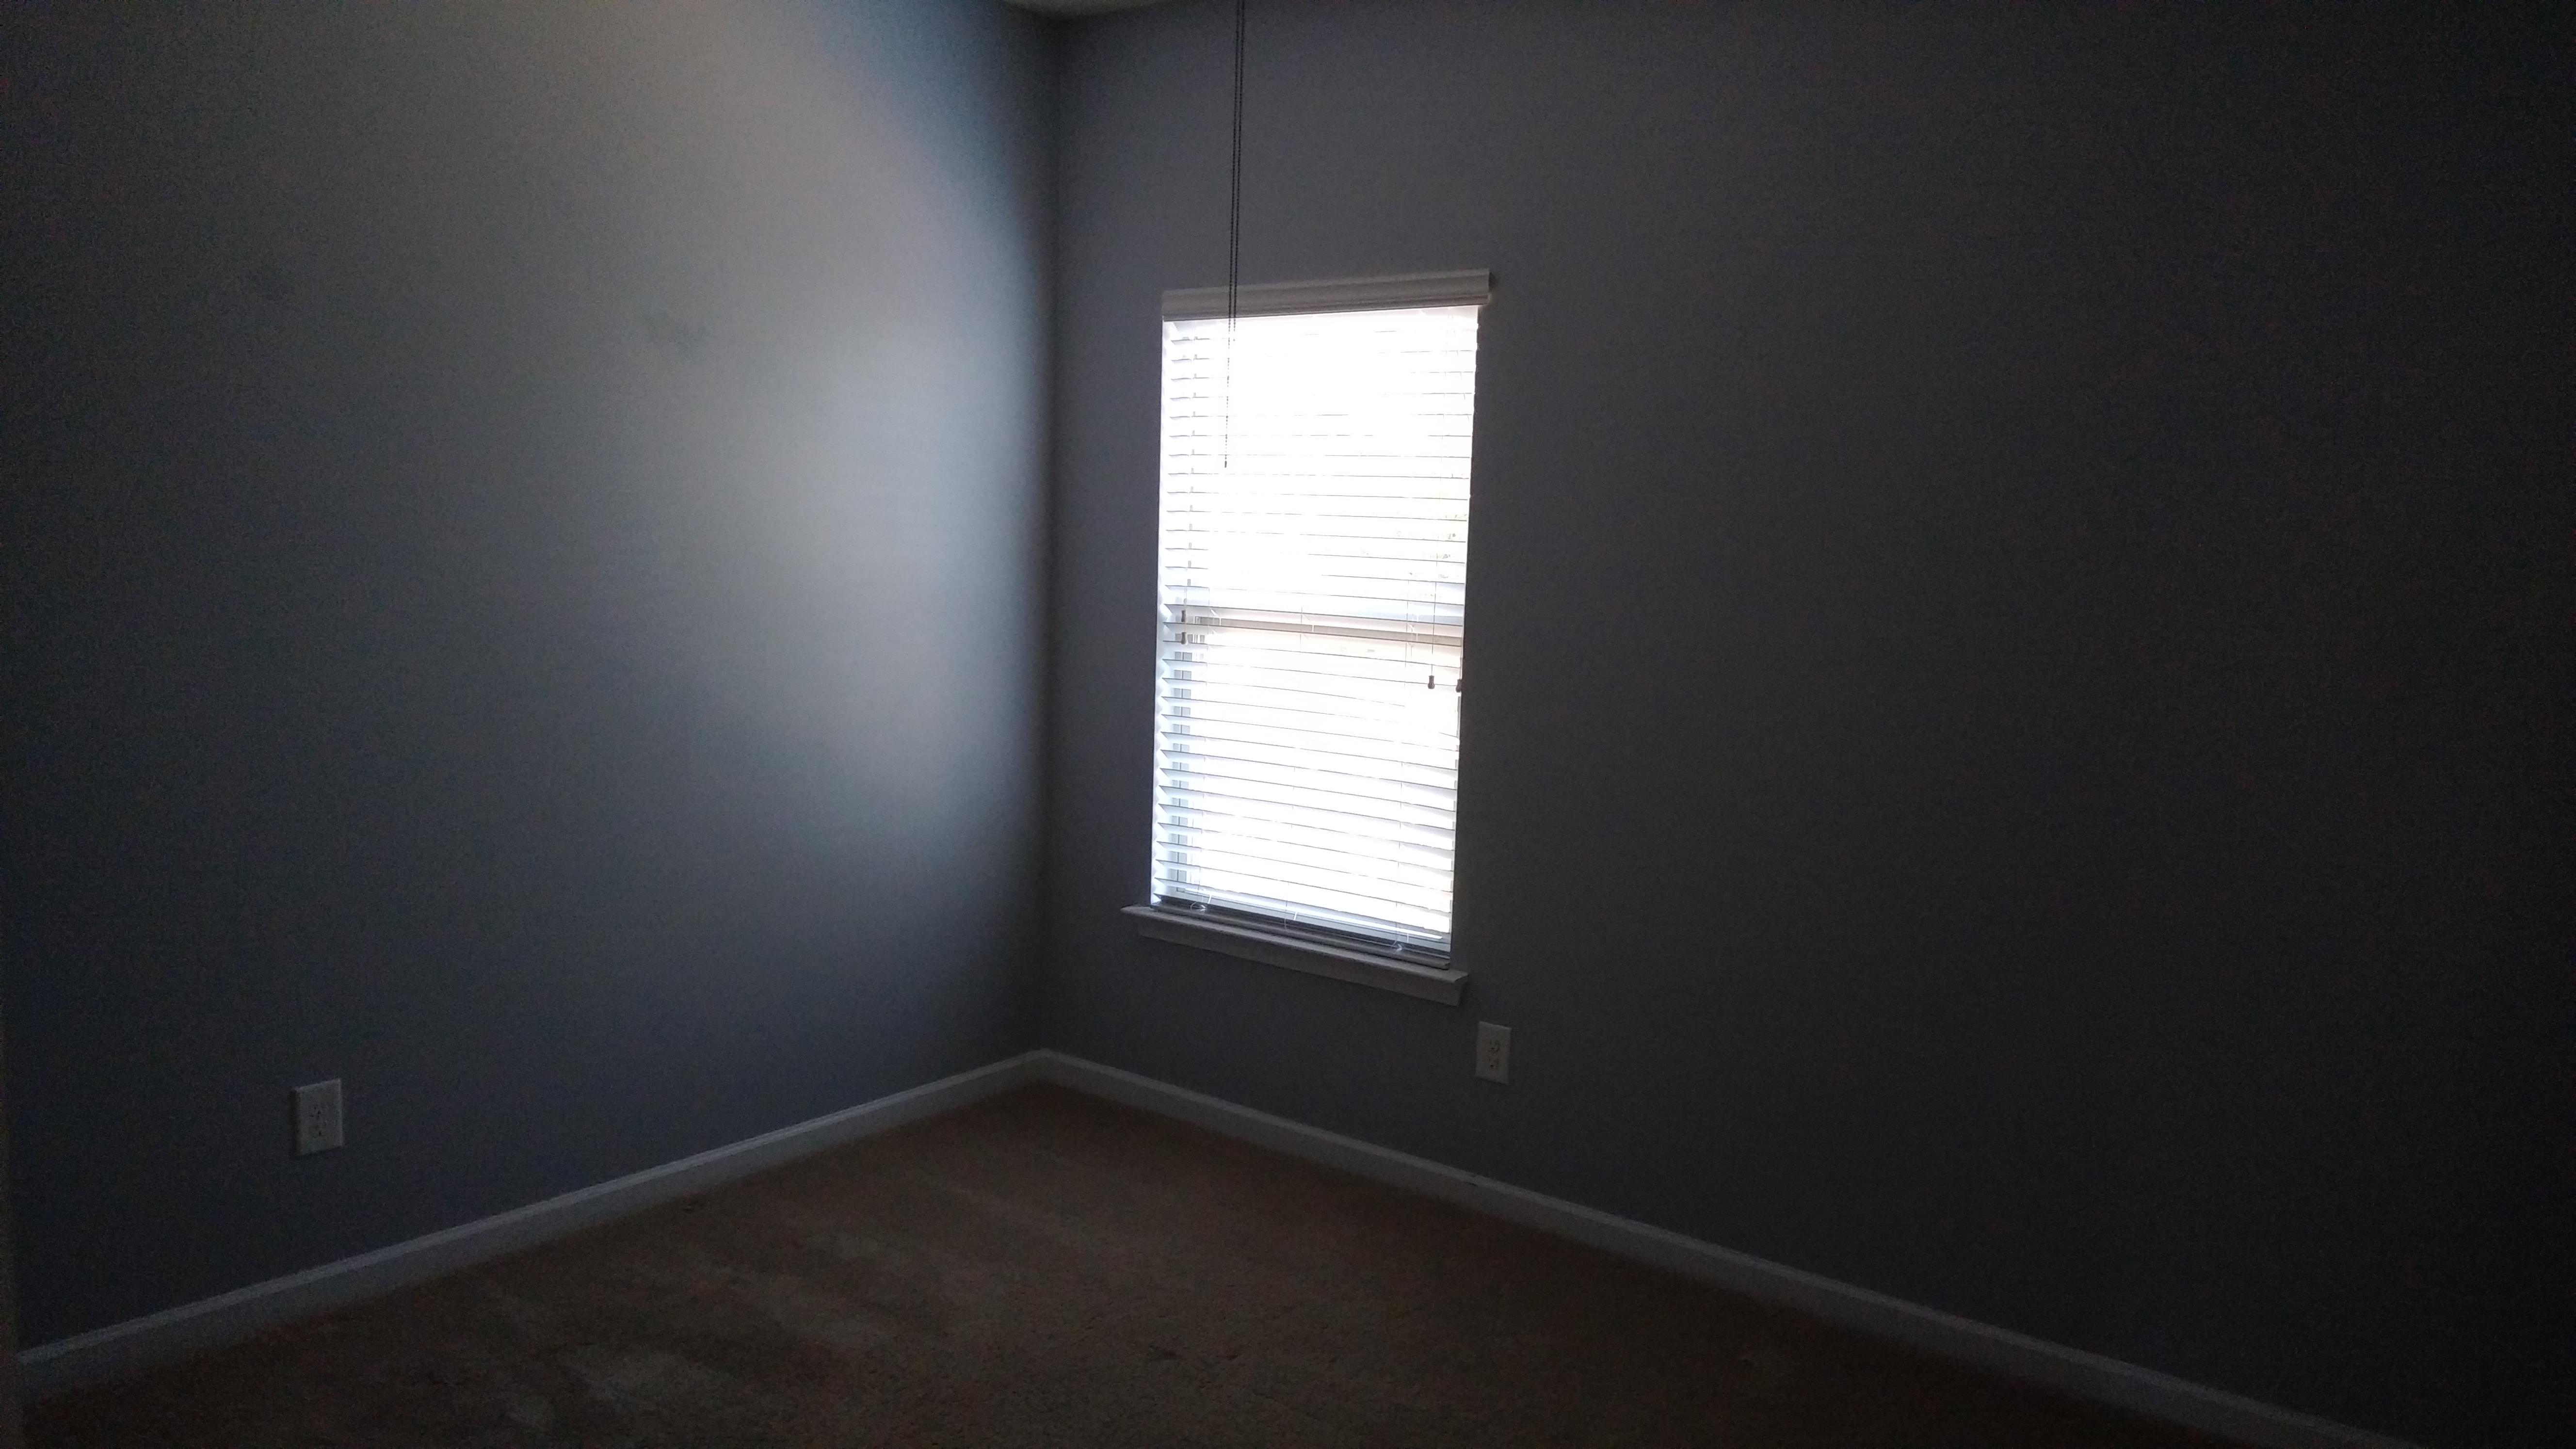 Photo of 6995 Shady Oak Ln, Cumming, GA, 30040